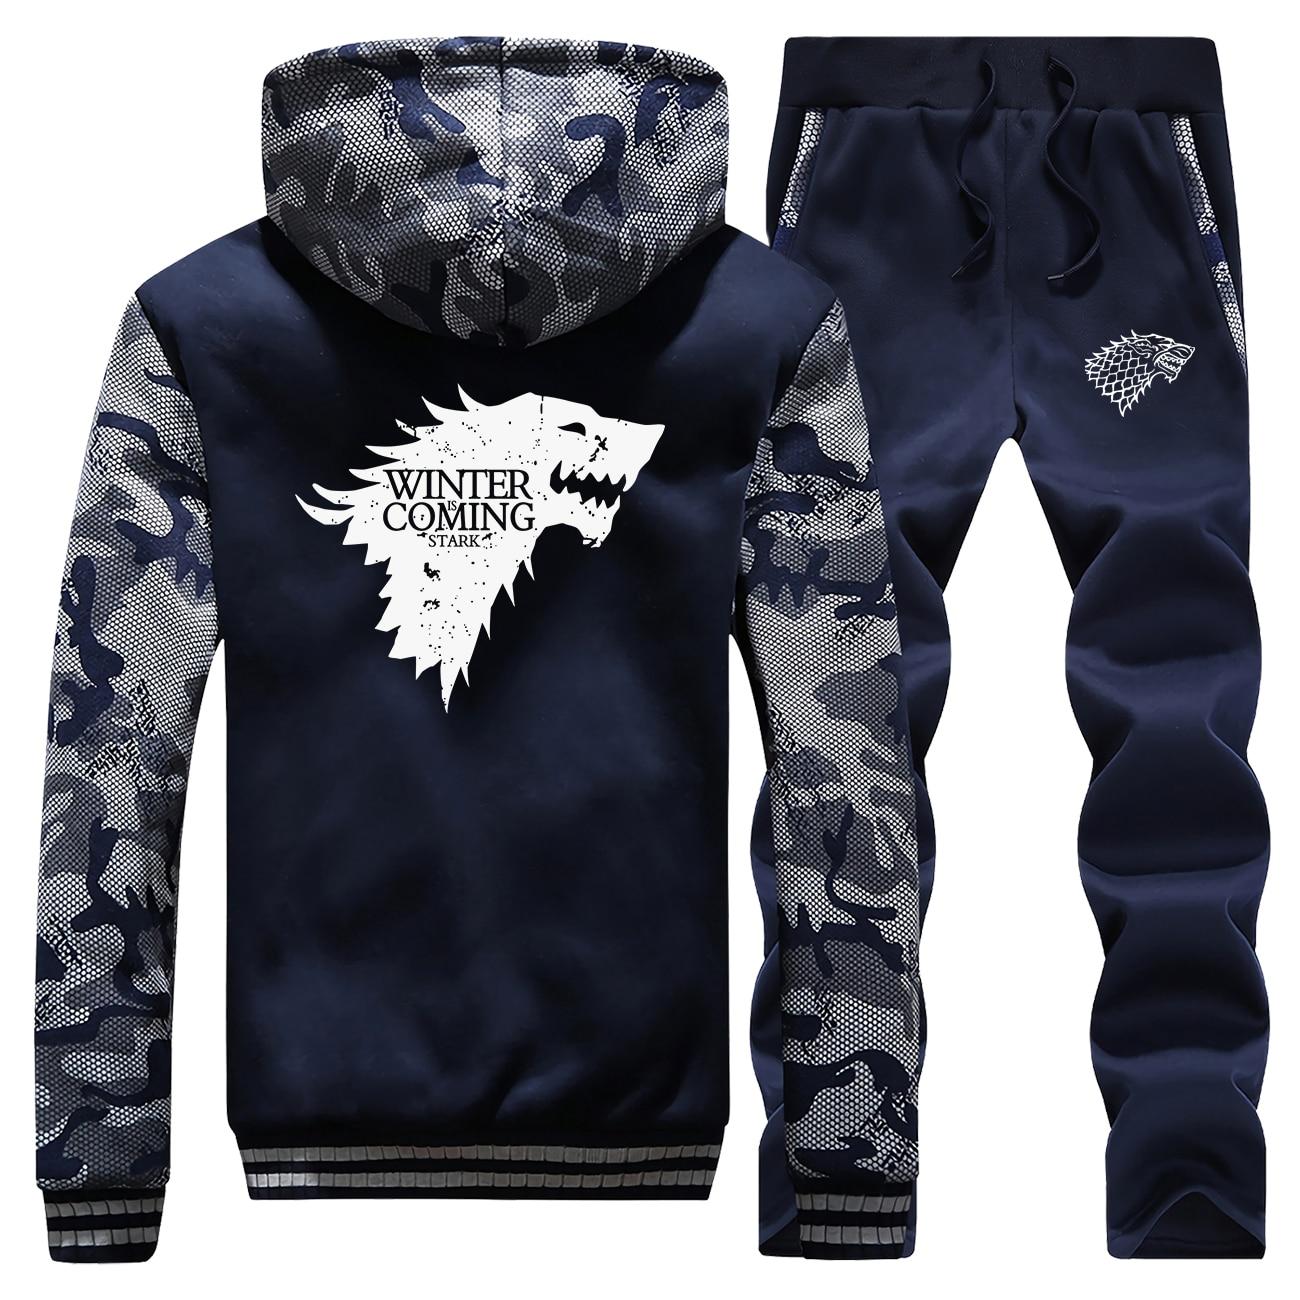 Jacket Winter Is Coming Men Sweatshirts+SweatPants 2 Piece Set Mens Camouflage Hoodies Trousers Sets Wolf Tracksuit Warm Suit